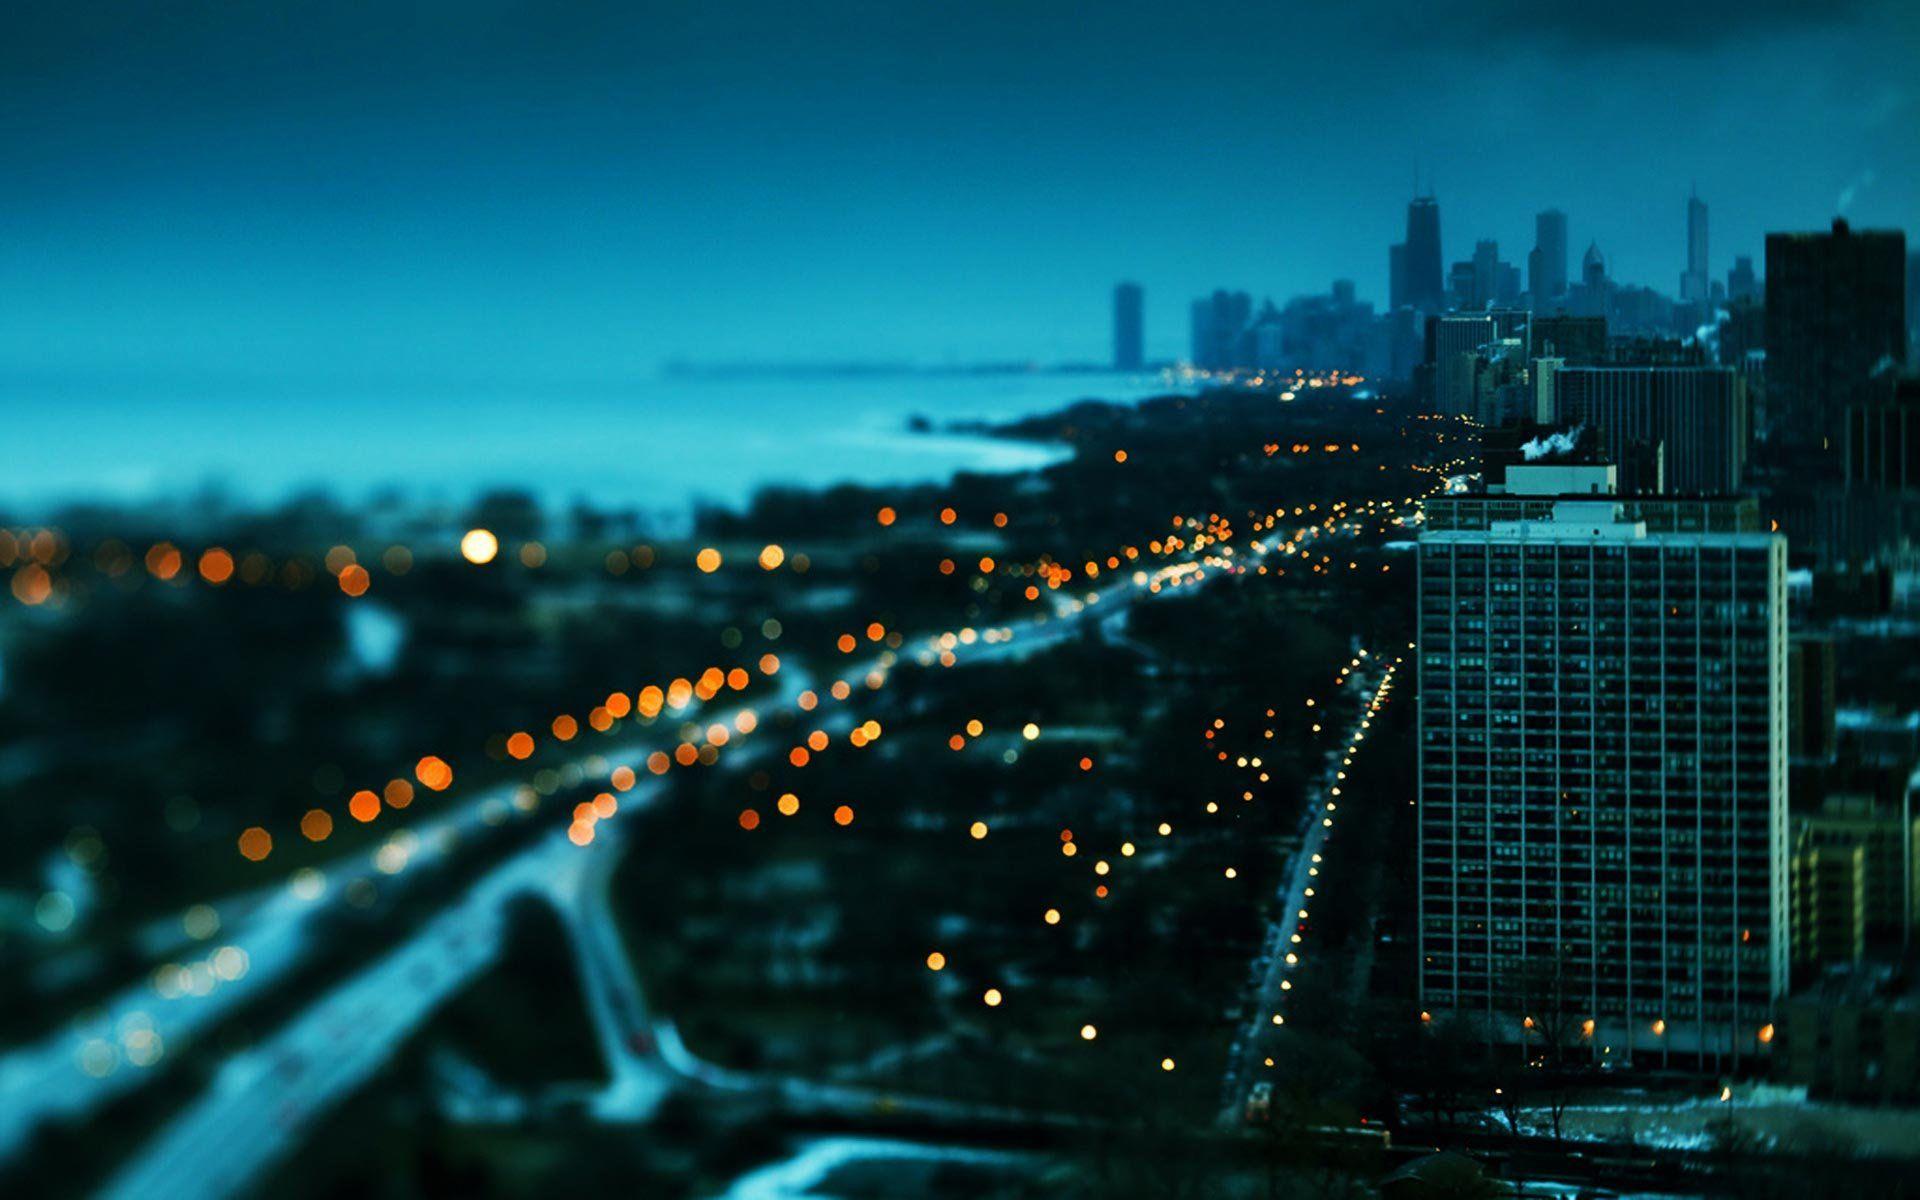 Night City Wallpapers Hd Wallpaper Walldevil Best Free Hd City At Night Wallpaper City Wallpaper New York City At Night